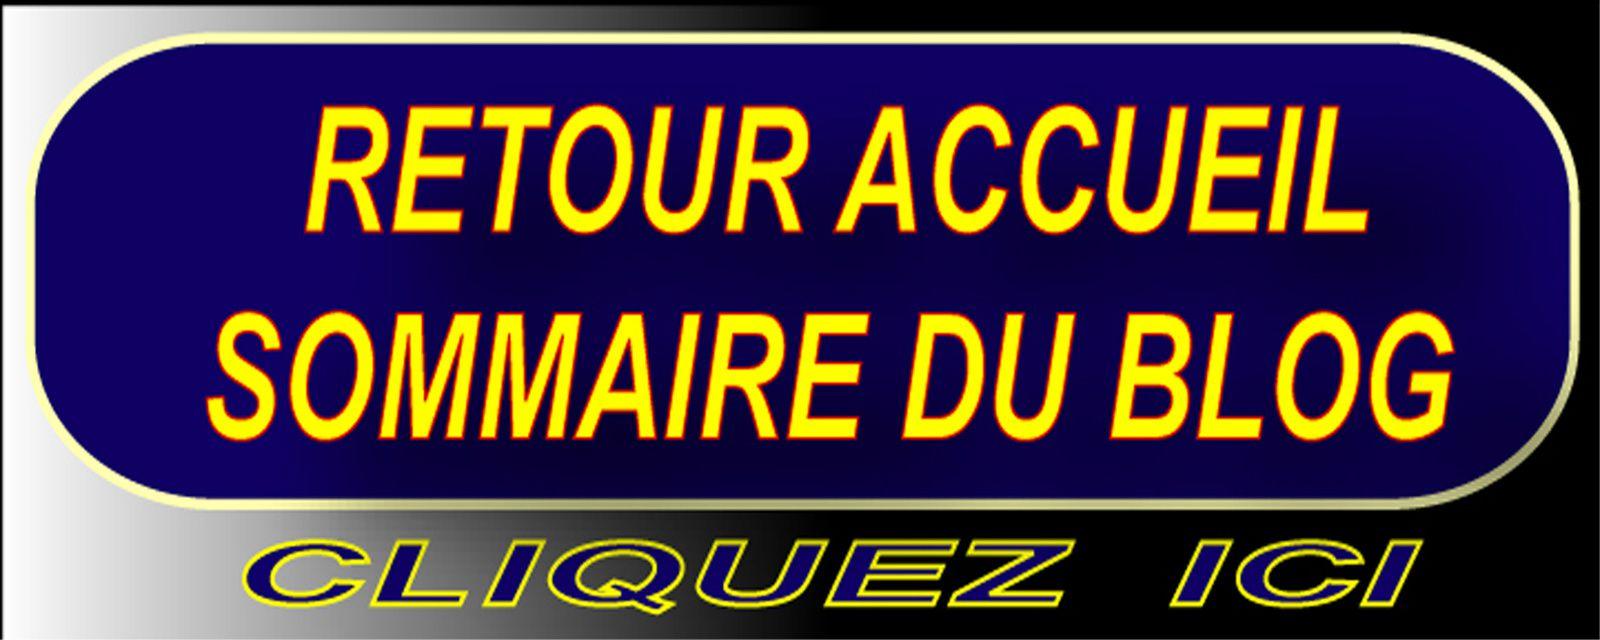 RETOUR-ACCUEIL-BLOG-DRANREB0434